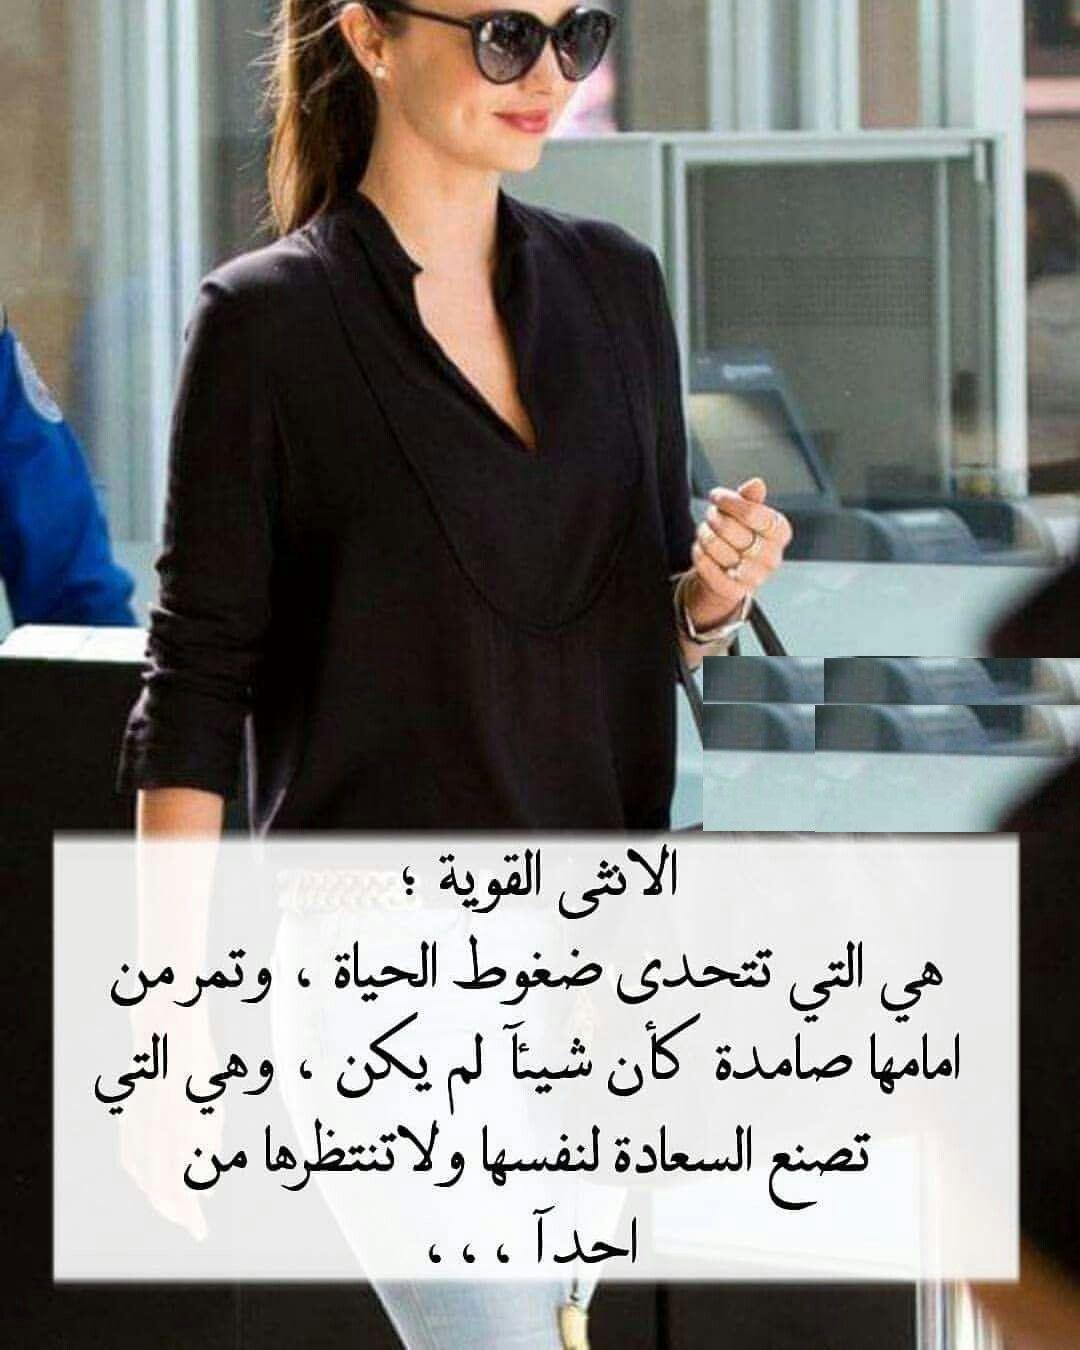 Pin By Ali Ali On حكم ونكات Tattoos